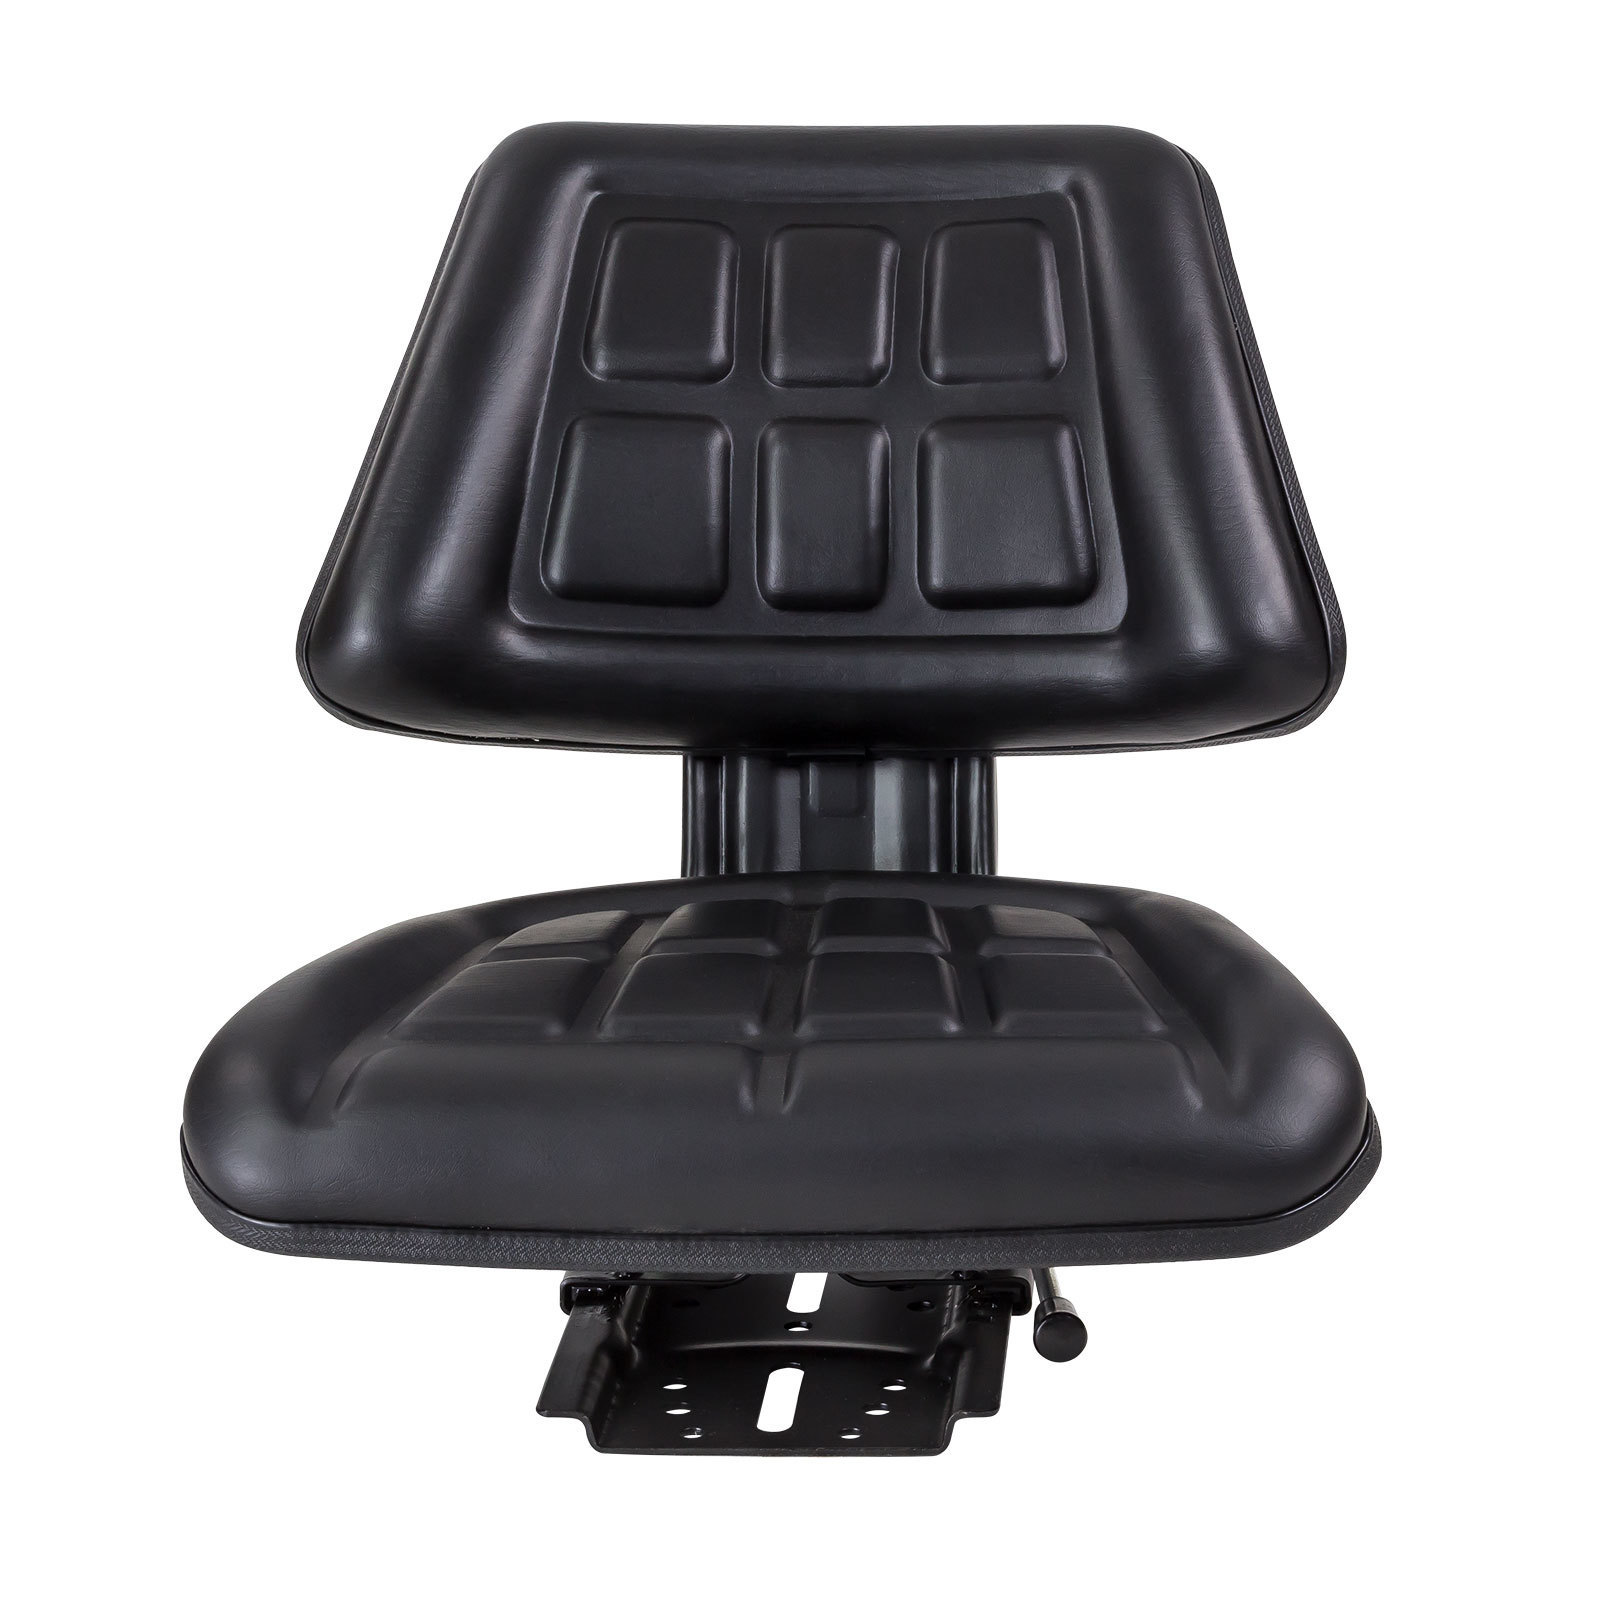 Universal Traktorsitz Schleppersitz Traktor Sitz Eco OF belastbar bis 130 kg